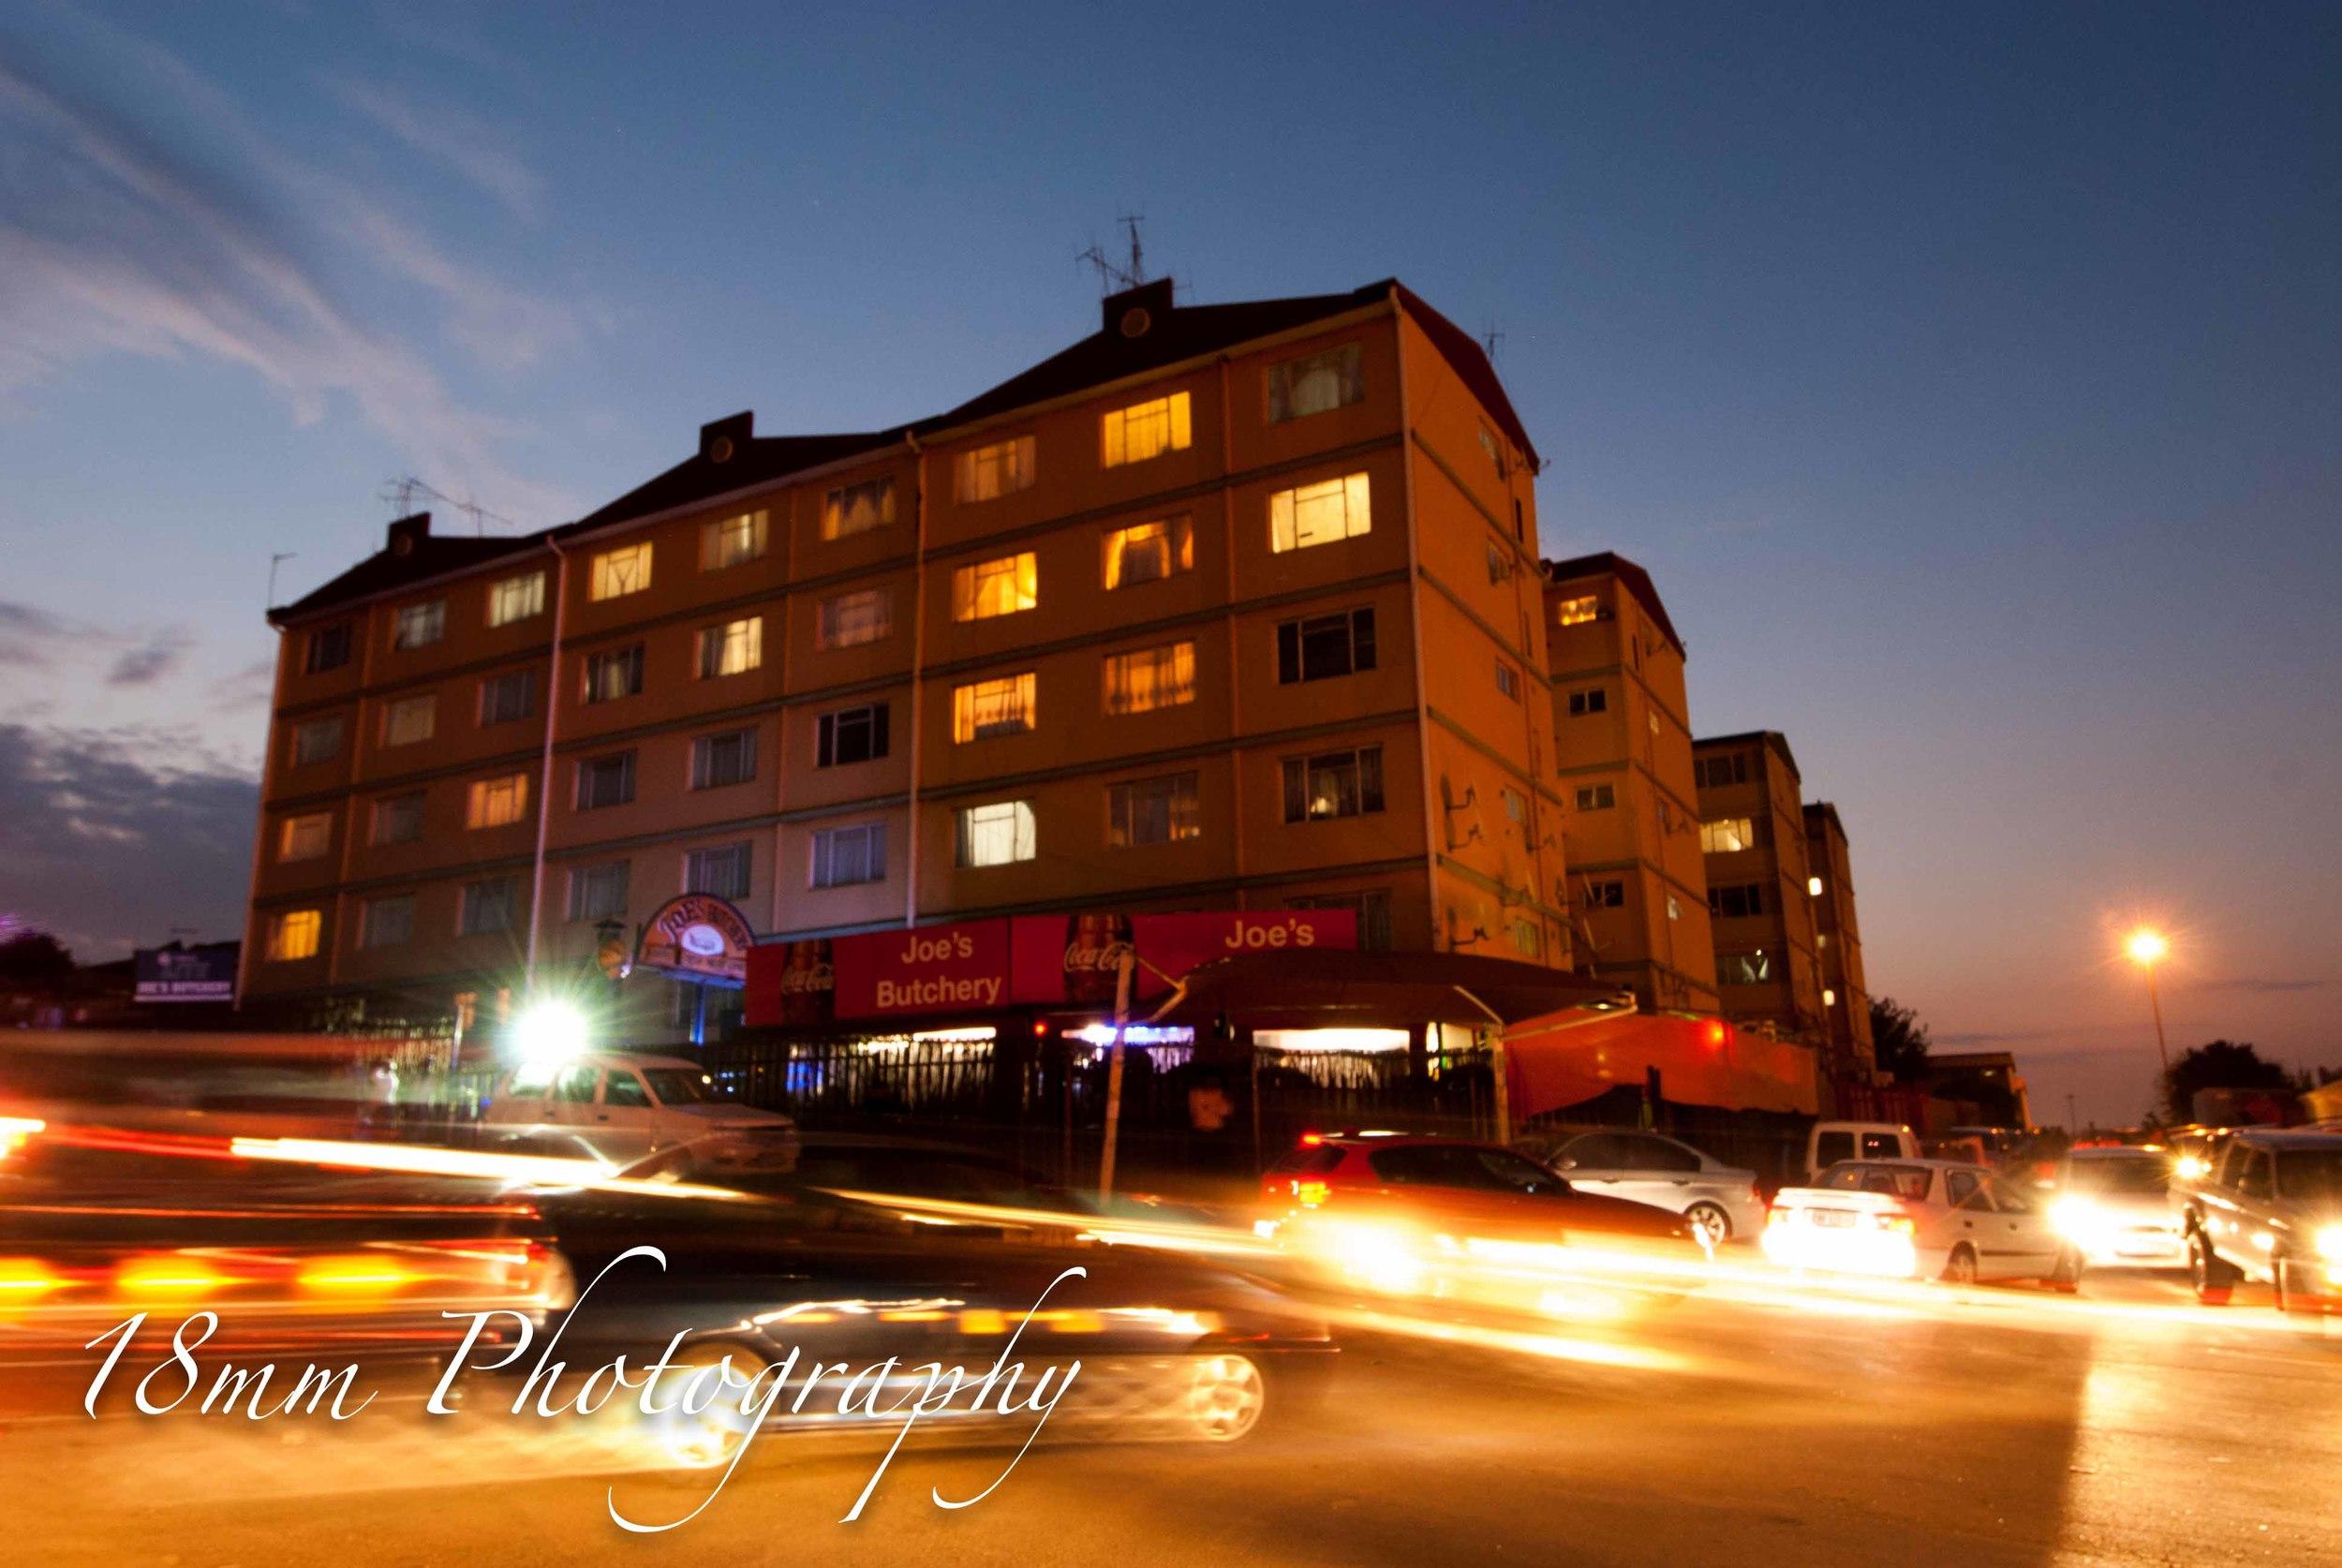 Night Photography 3.jpg